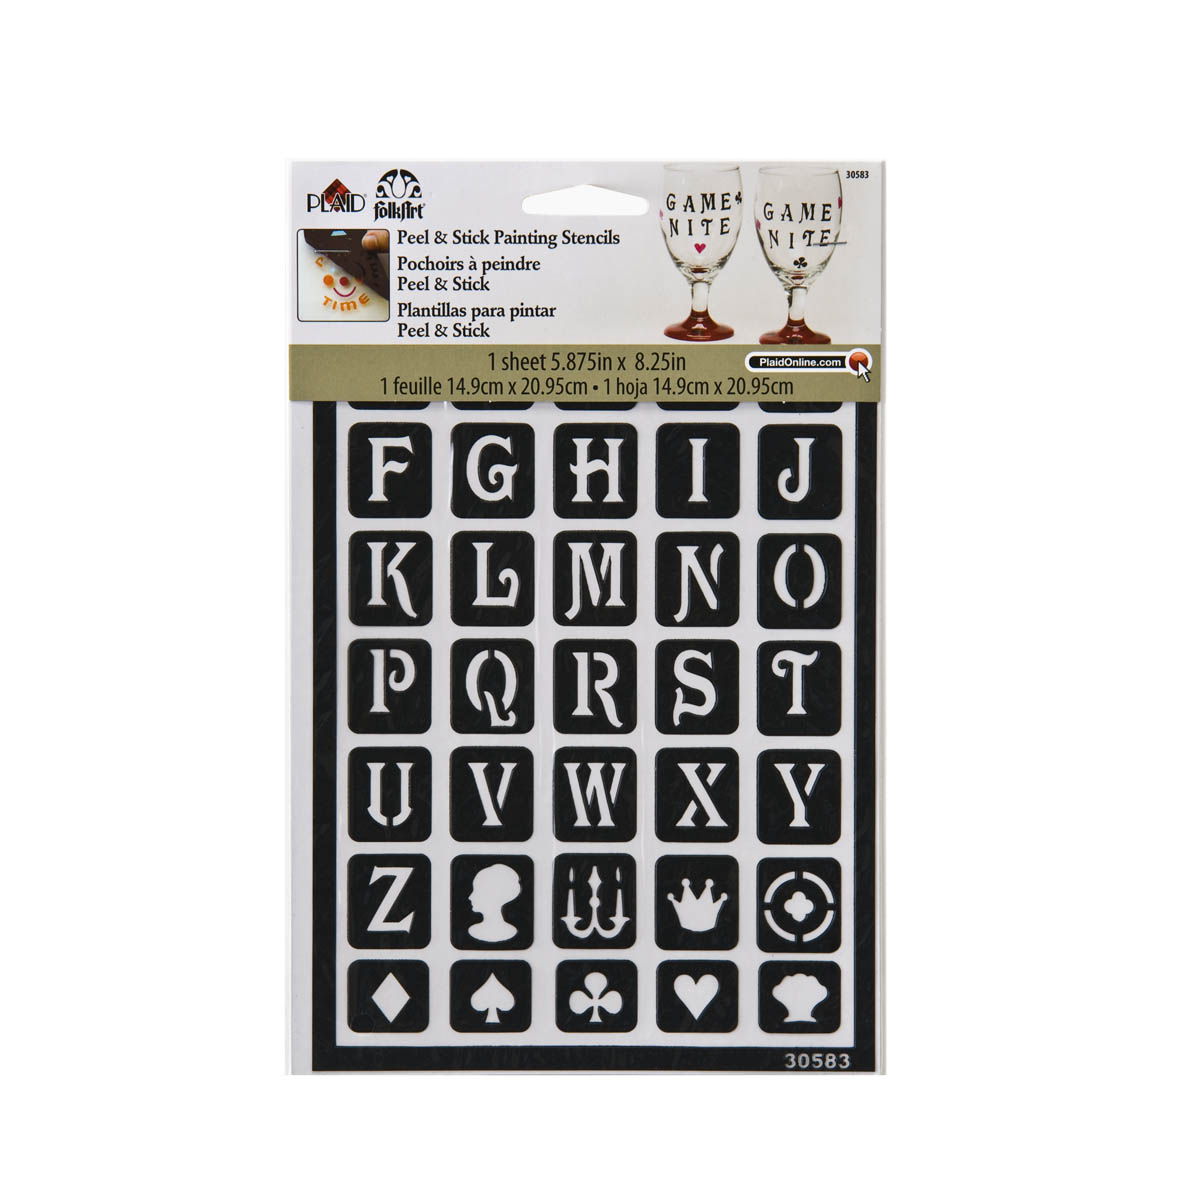 FolkArt ® Peel & Stick Painting Stencils™ - Classic Alphabet - 30583